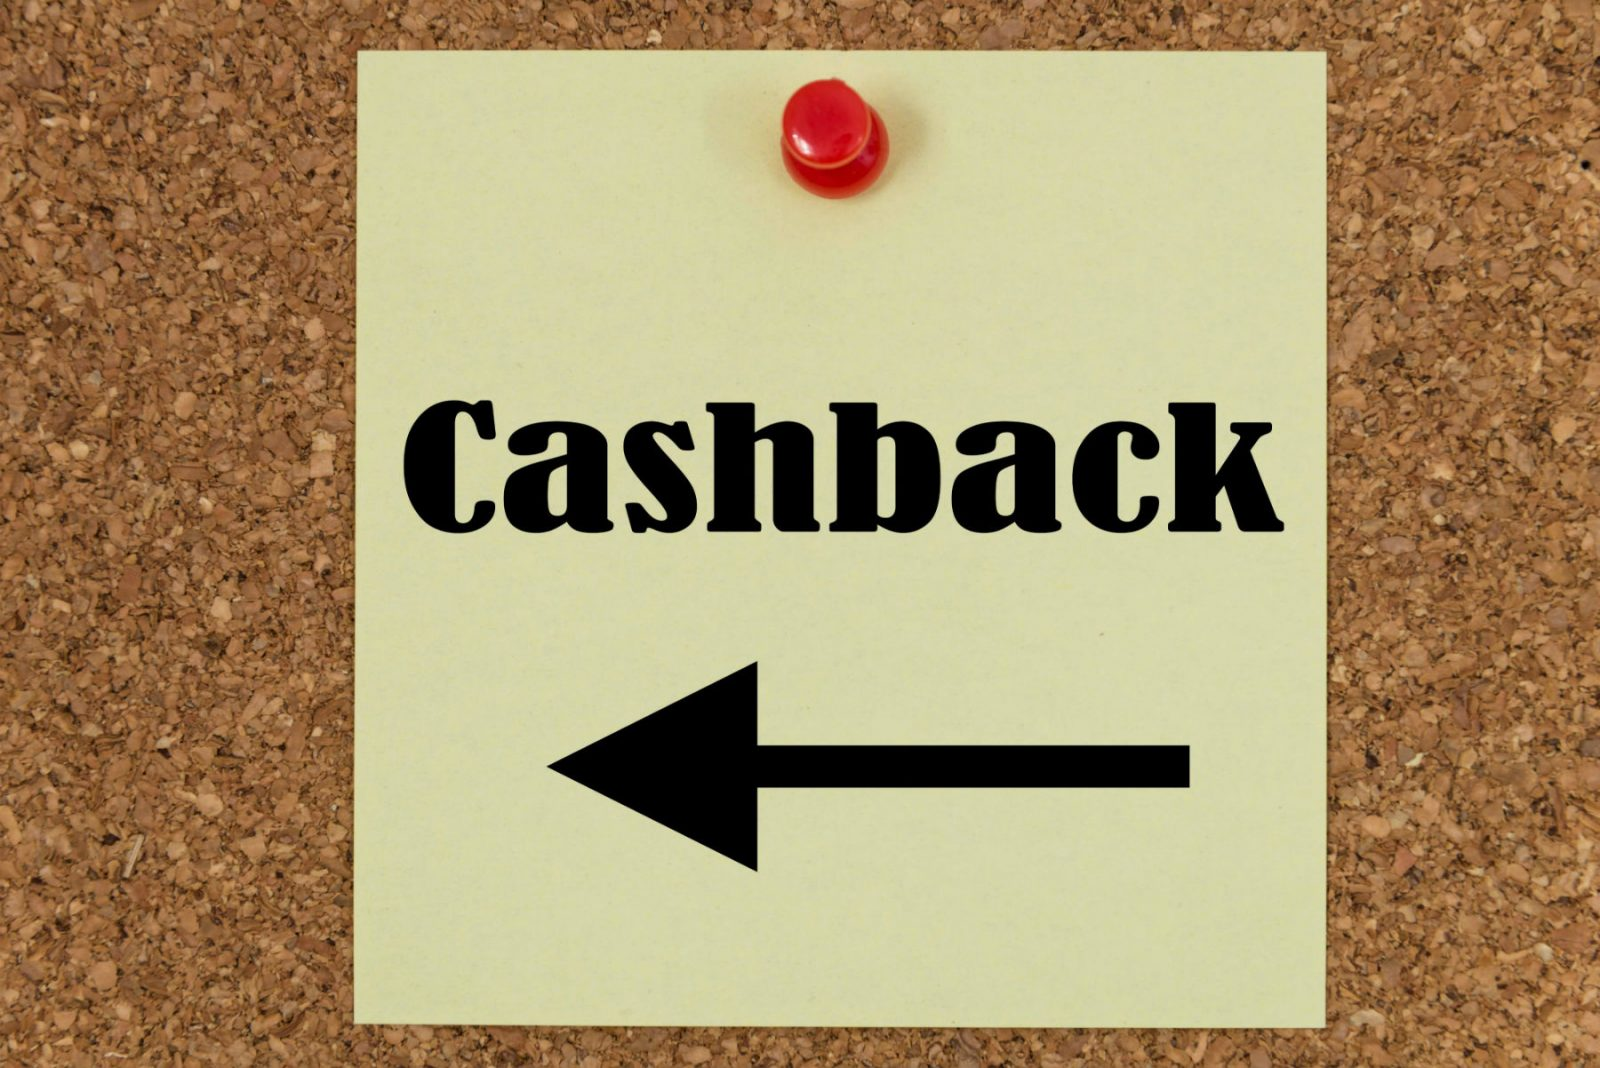 Услуга Cashback от Ростелекома